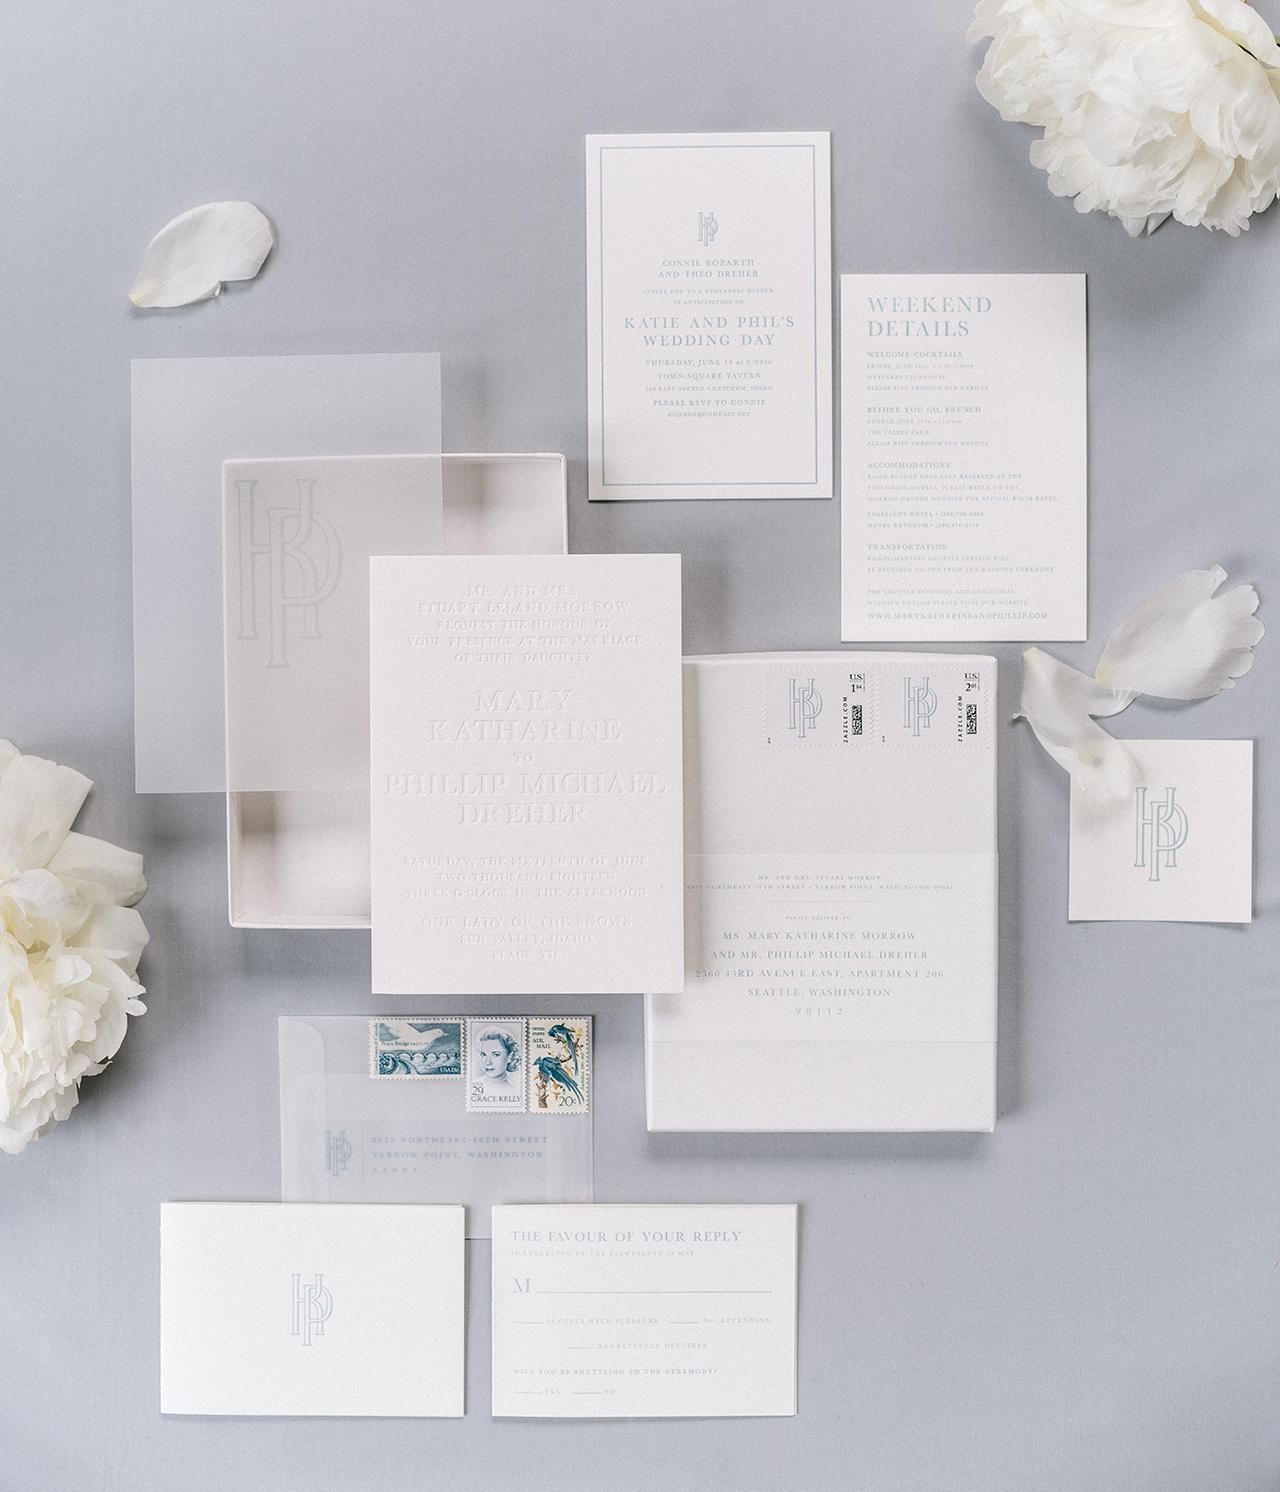 snowy white winter theme wedding invitation